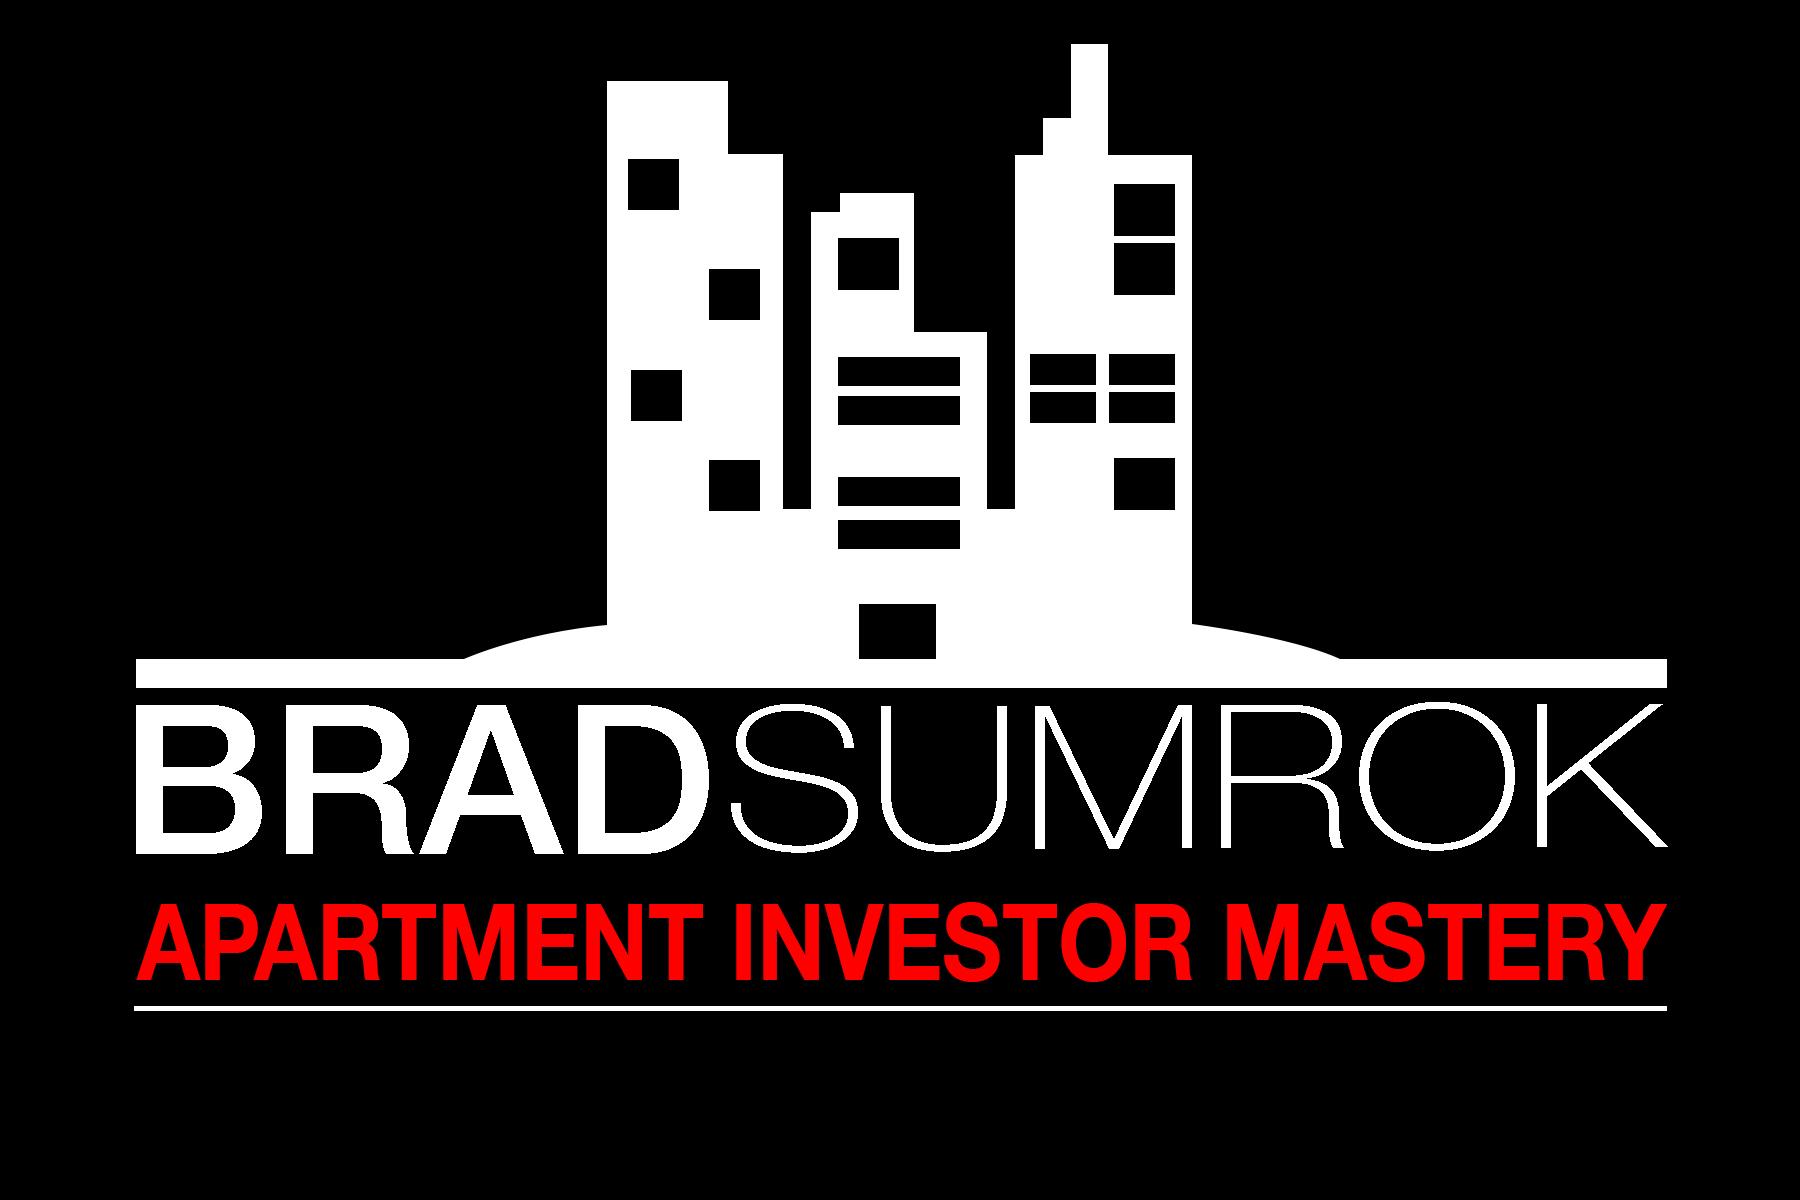 Brad Sumrok's Apartment Investor Mastery